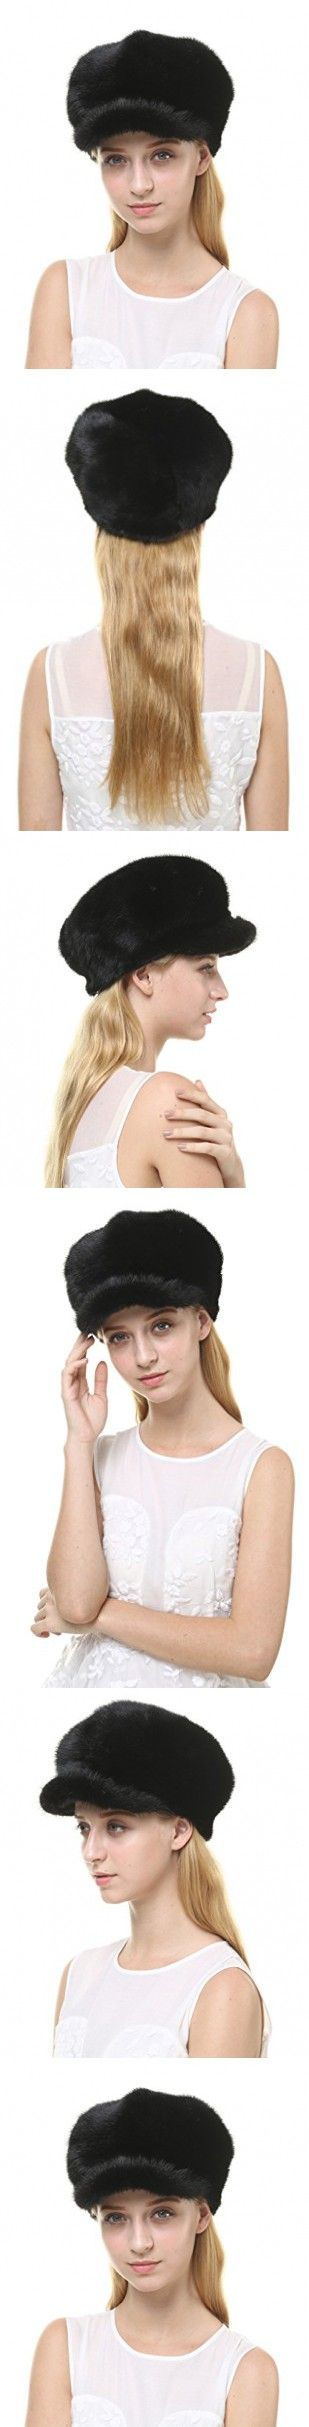 Vogueearth Women'Real Mink Fur Winter Warmer Flexible Berets Hat Black